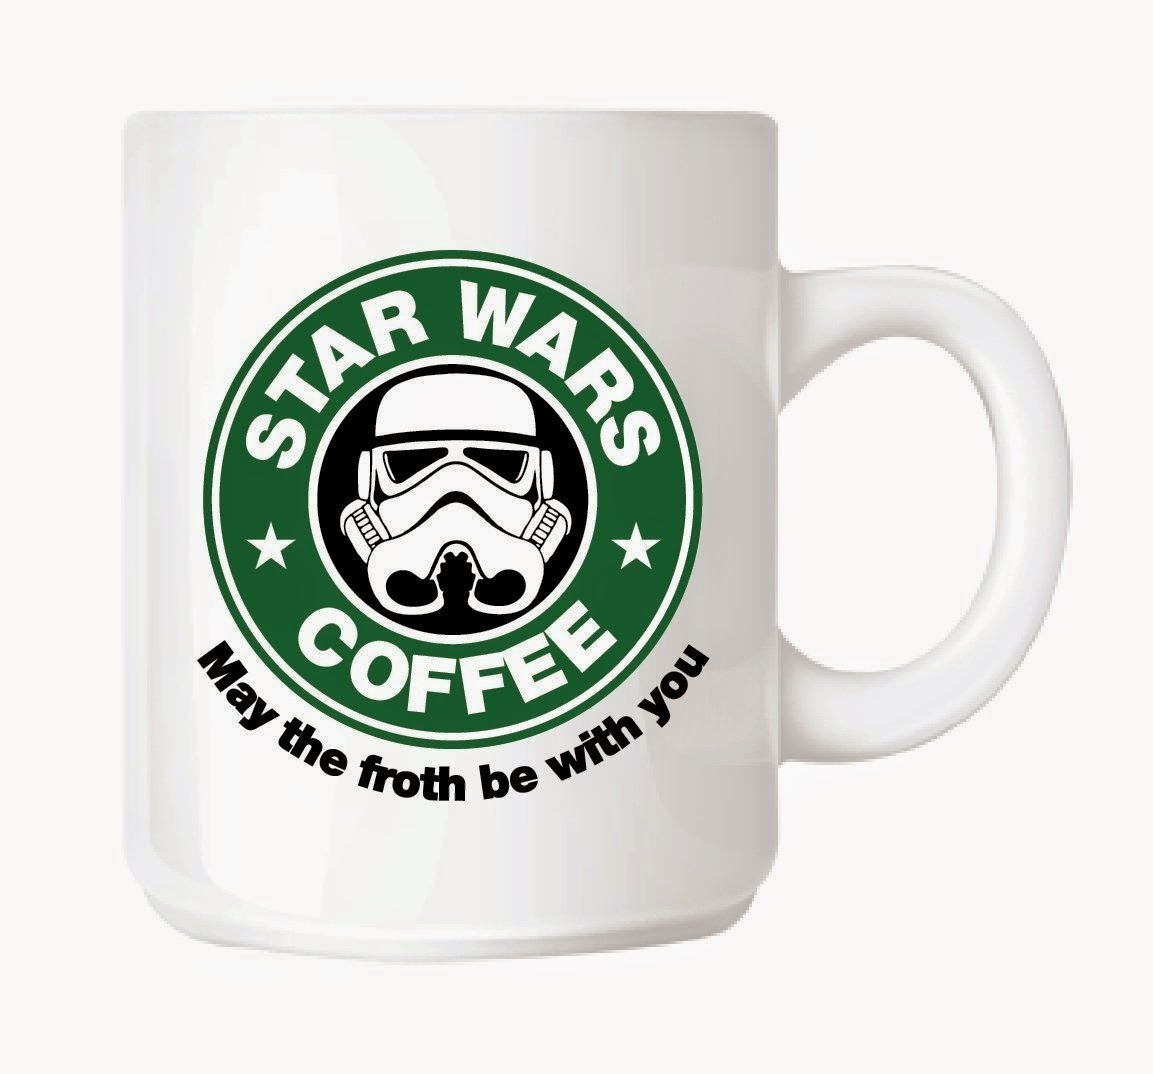 ¡Llévate una taza friki gratis!